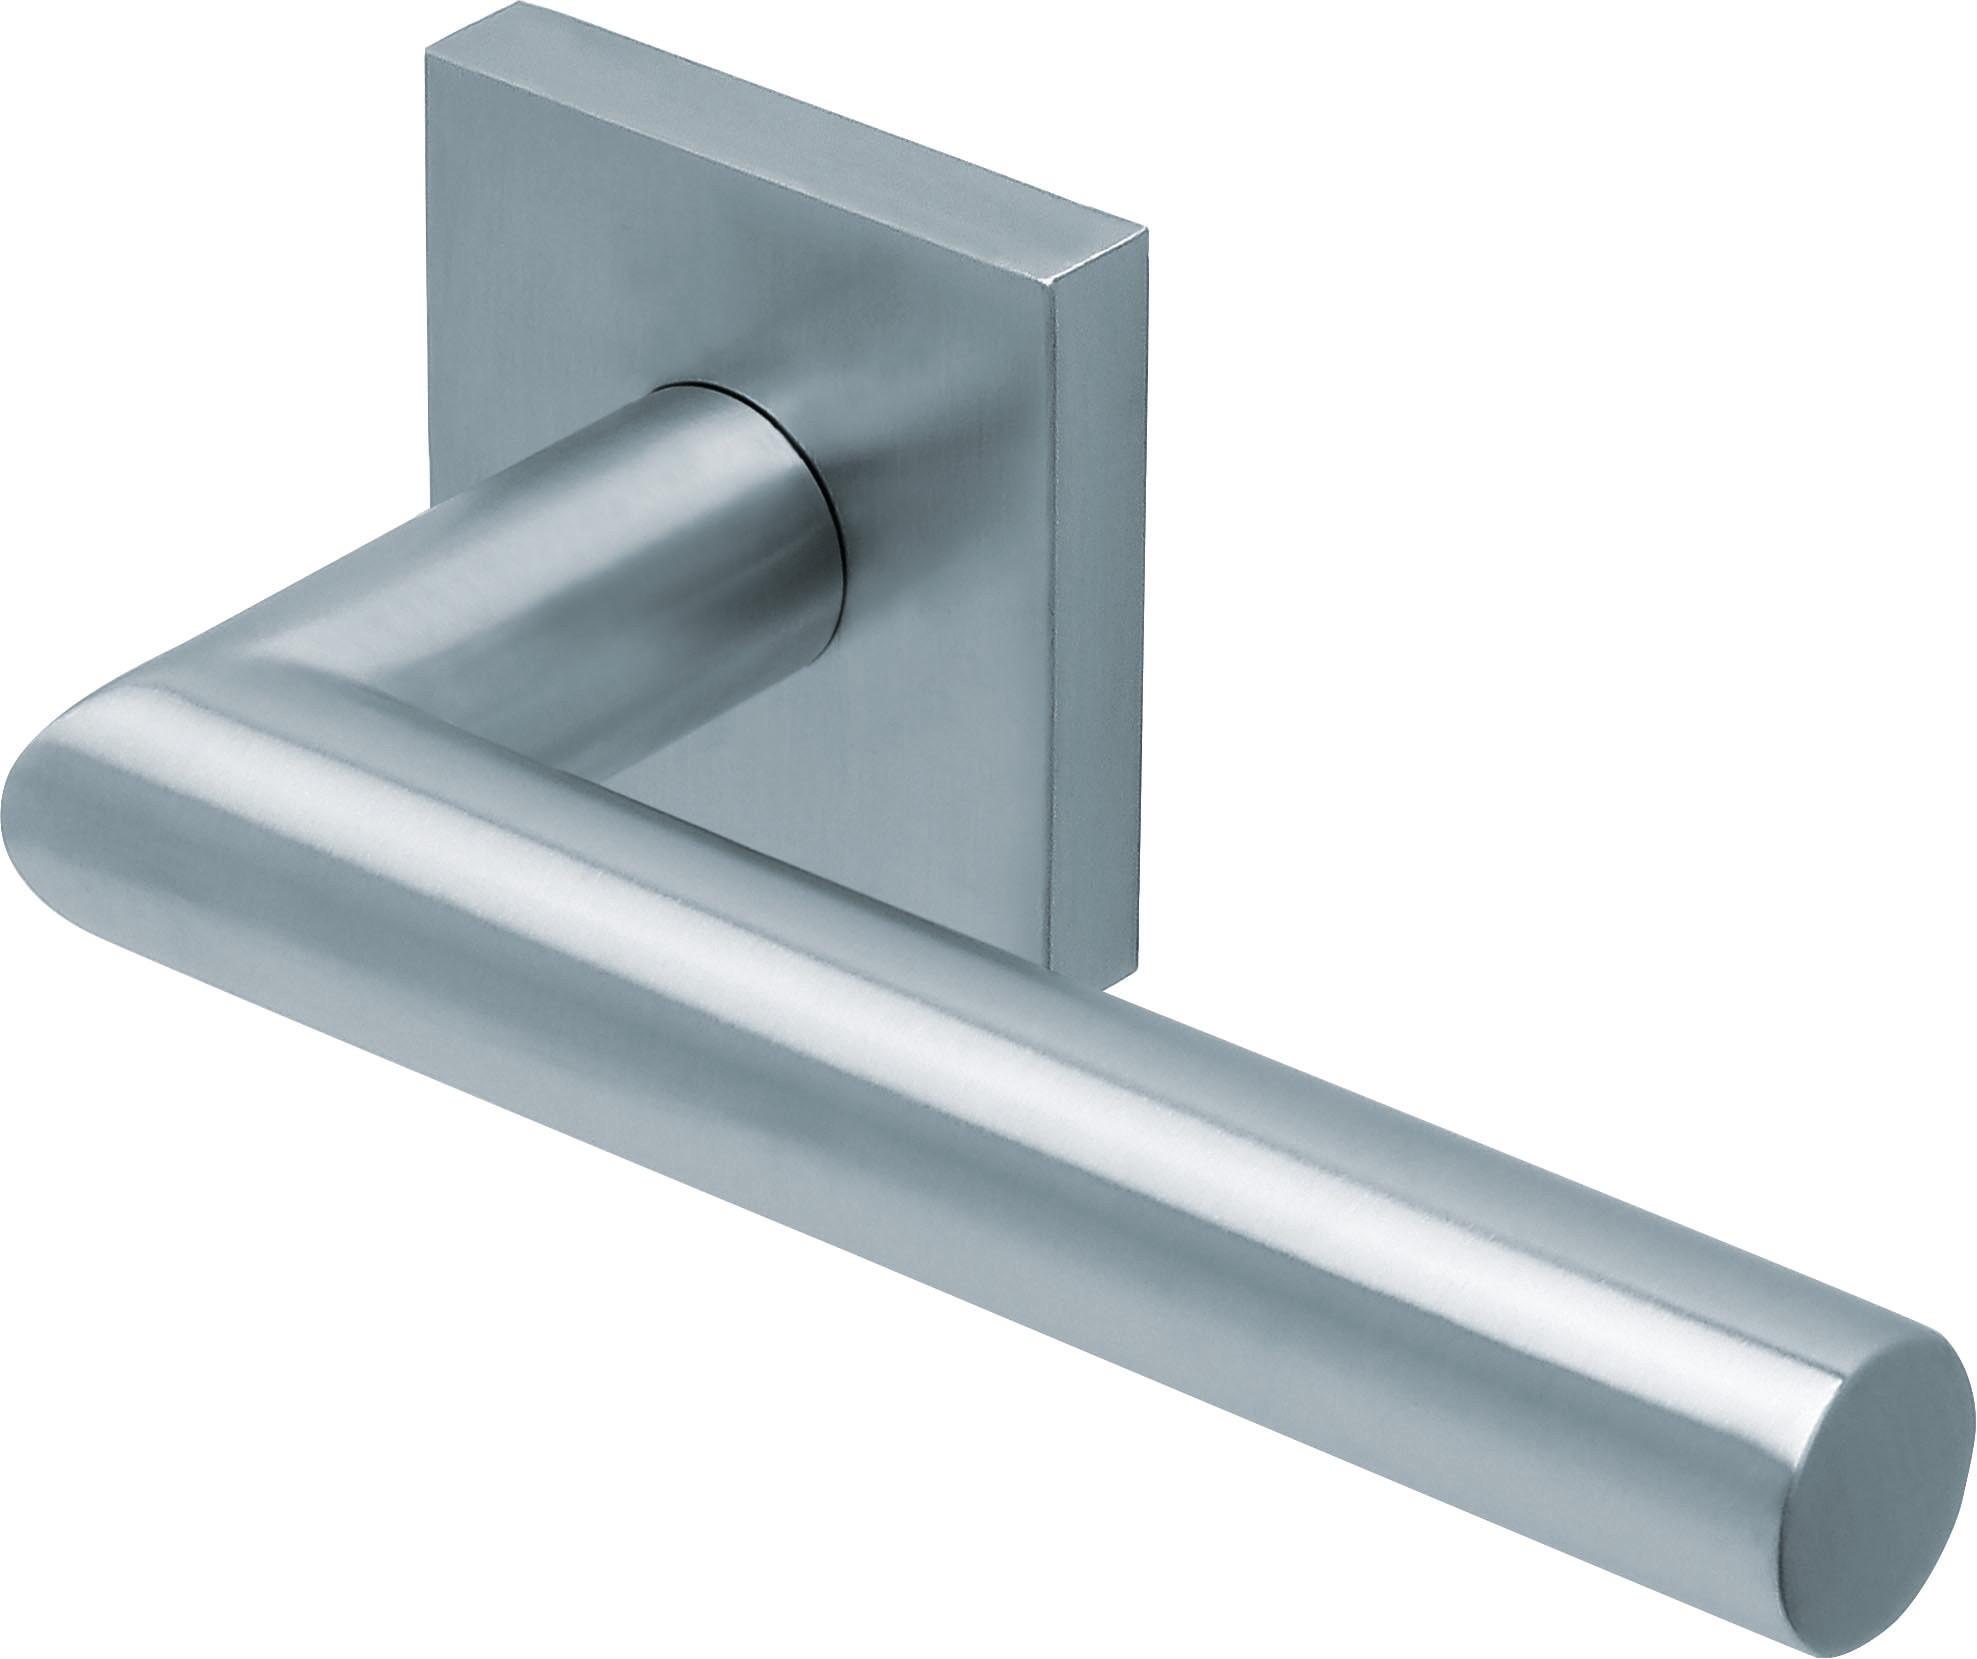 OLEA-quadrat-Edelstahl-matt